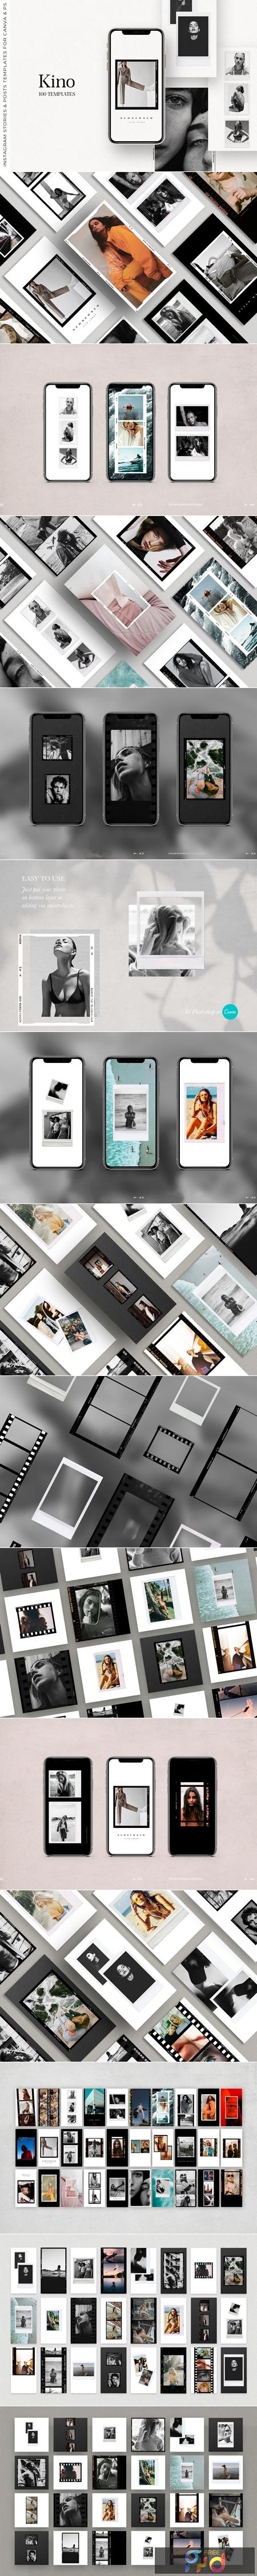 100 Film Frames & Instant Templates 3848678 1